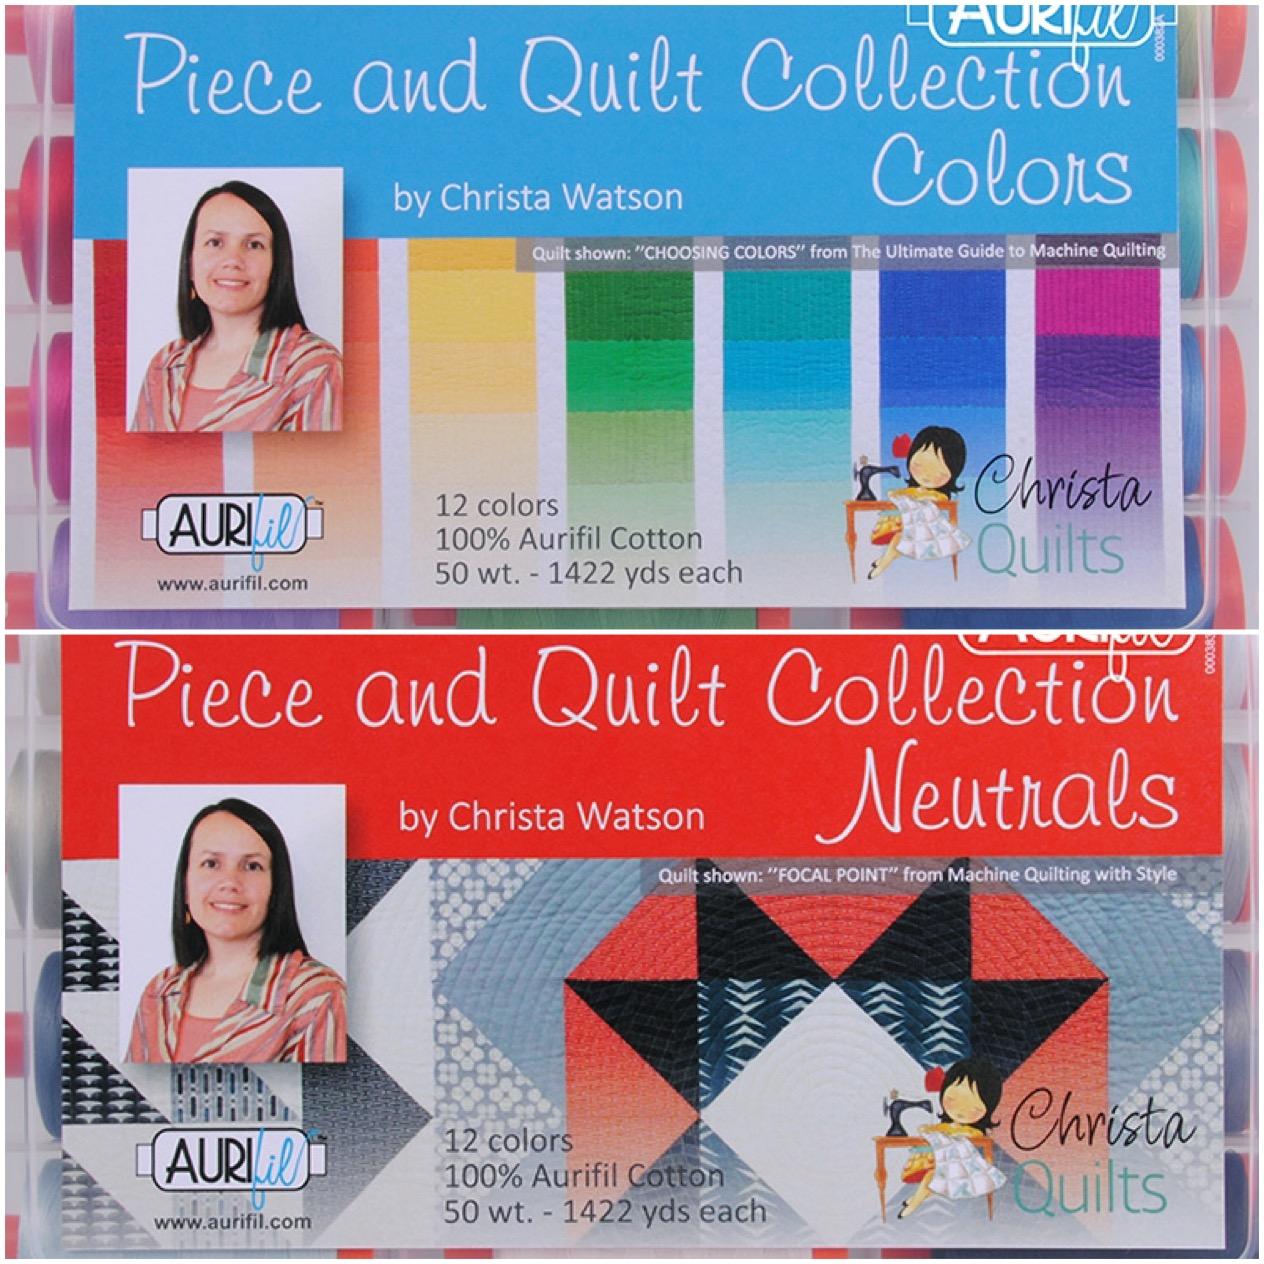 Christa Watson Aurifil Thread